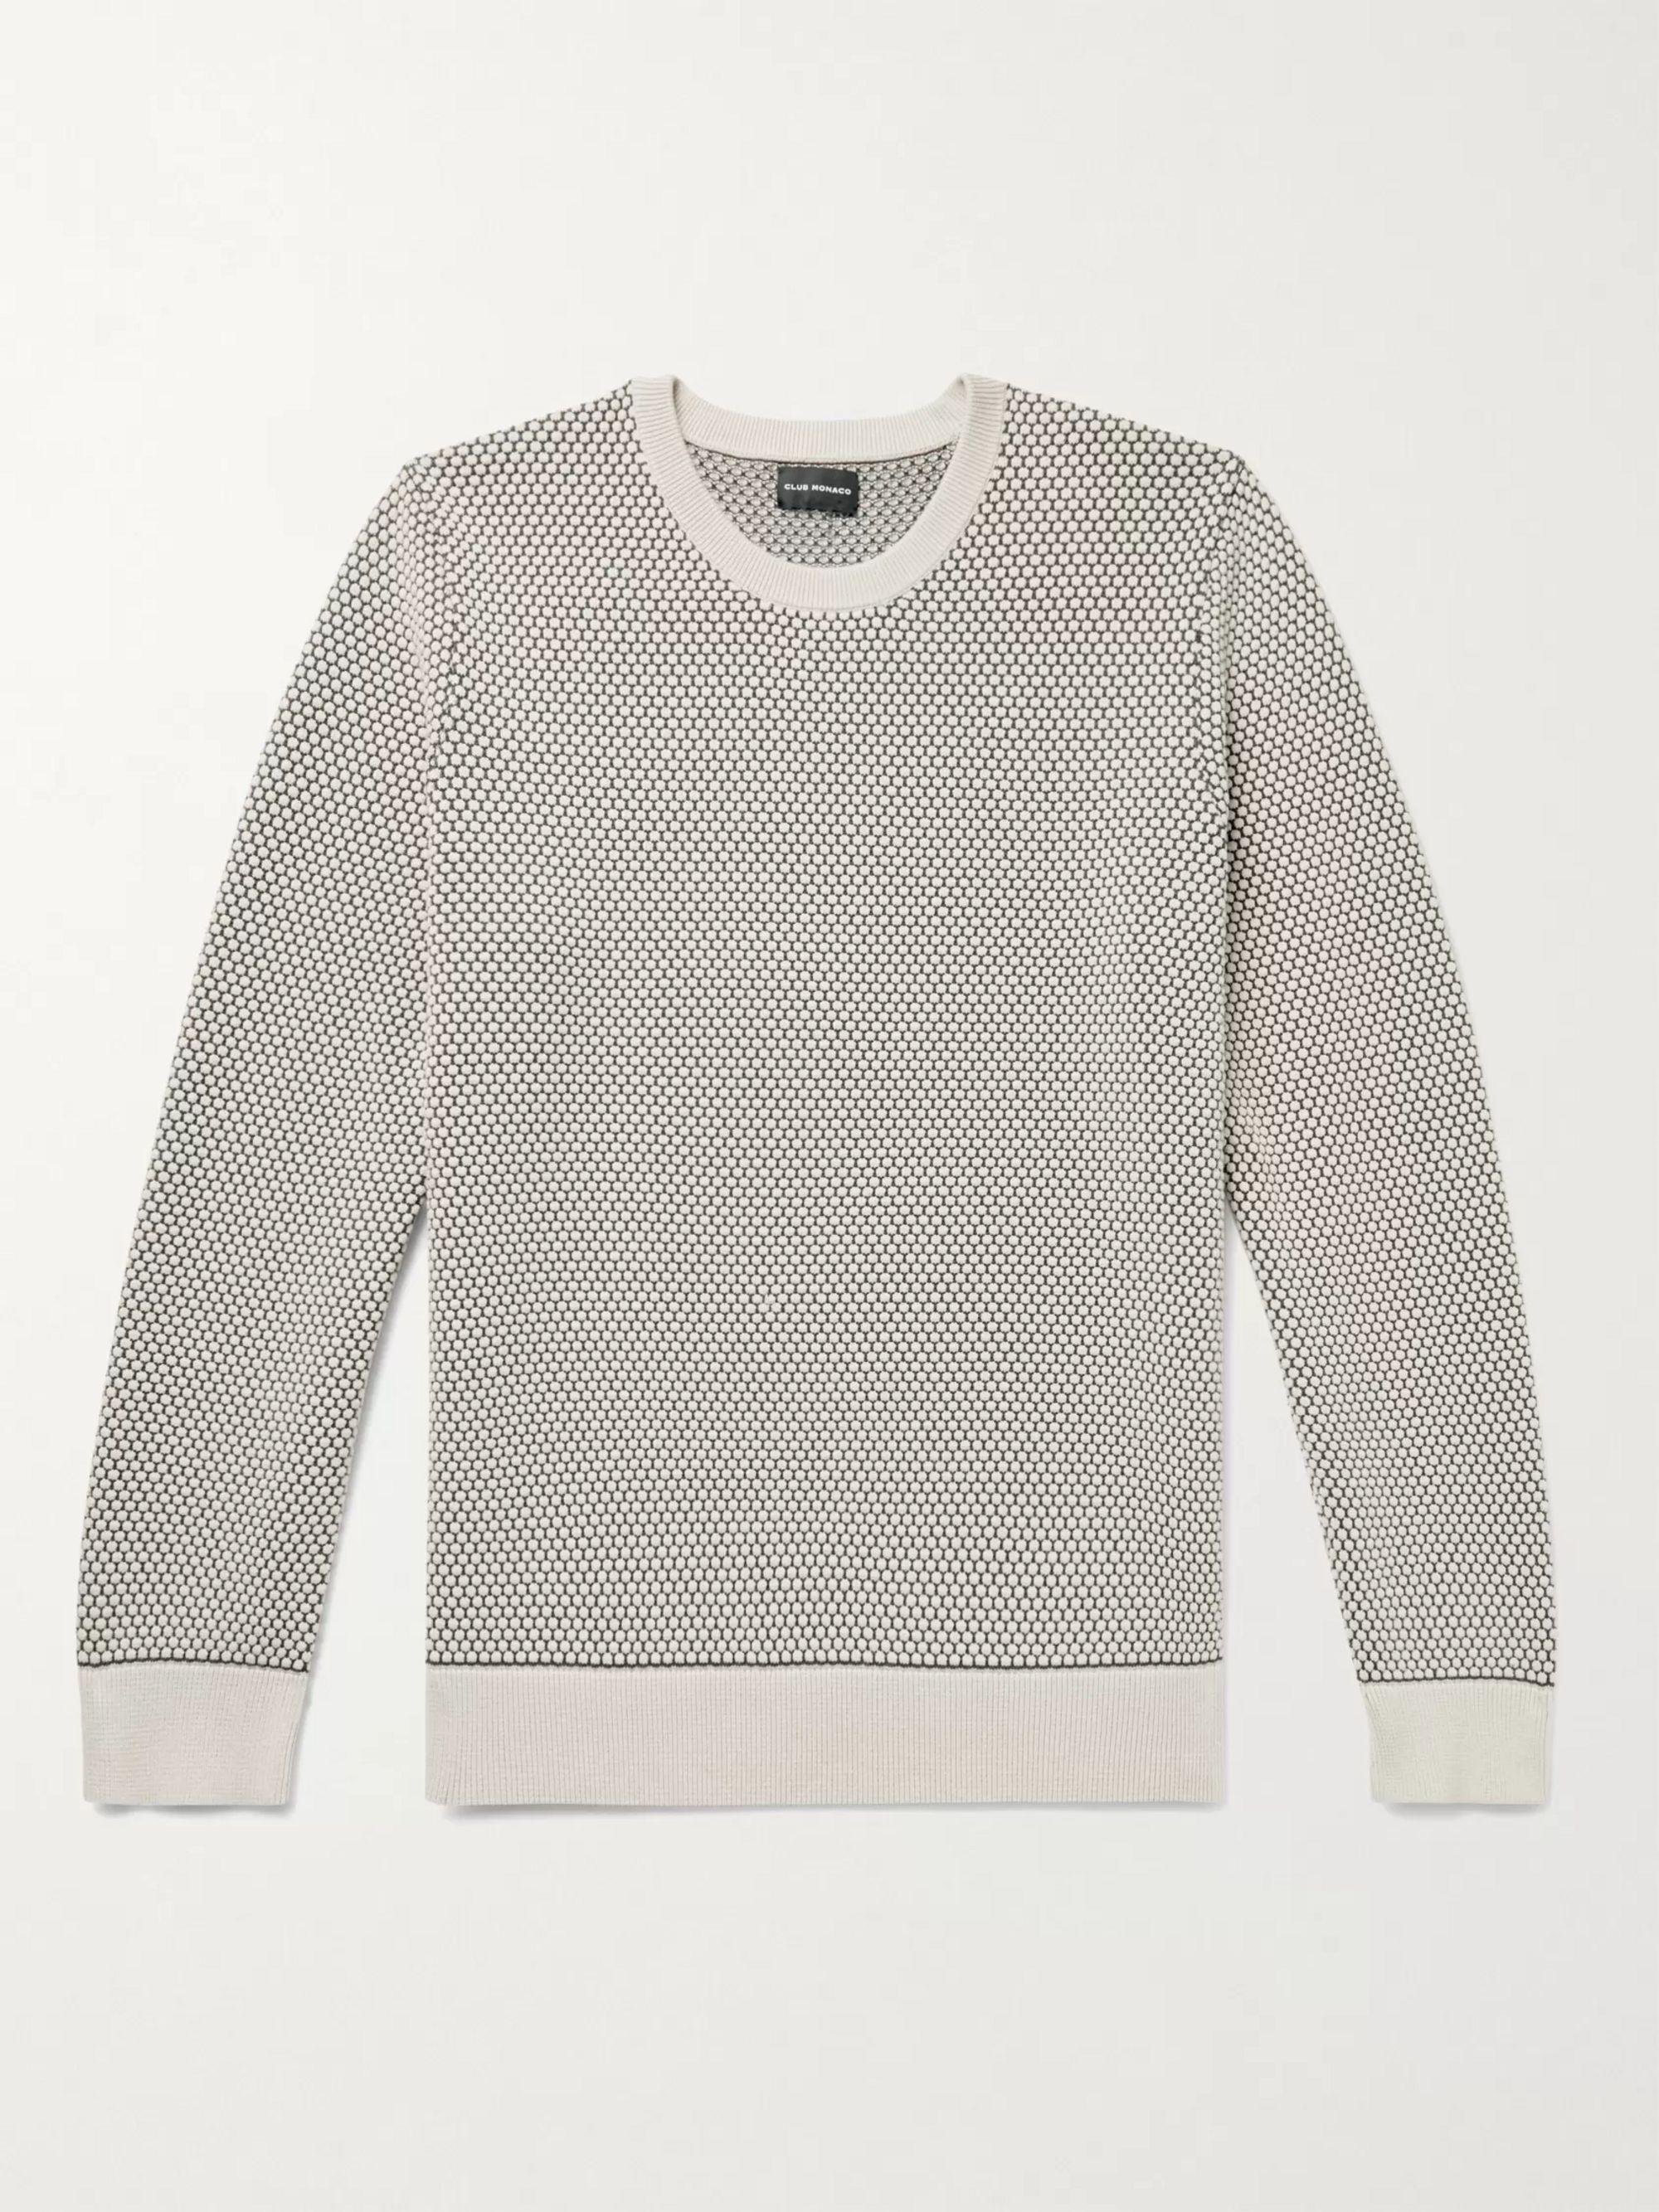 CLUB MONACO Honeycomb-Knit Cotton-Blend Sweater